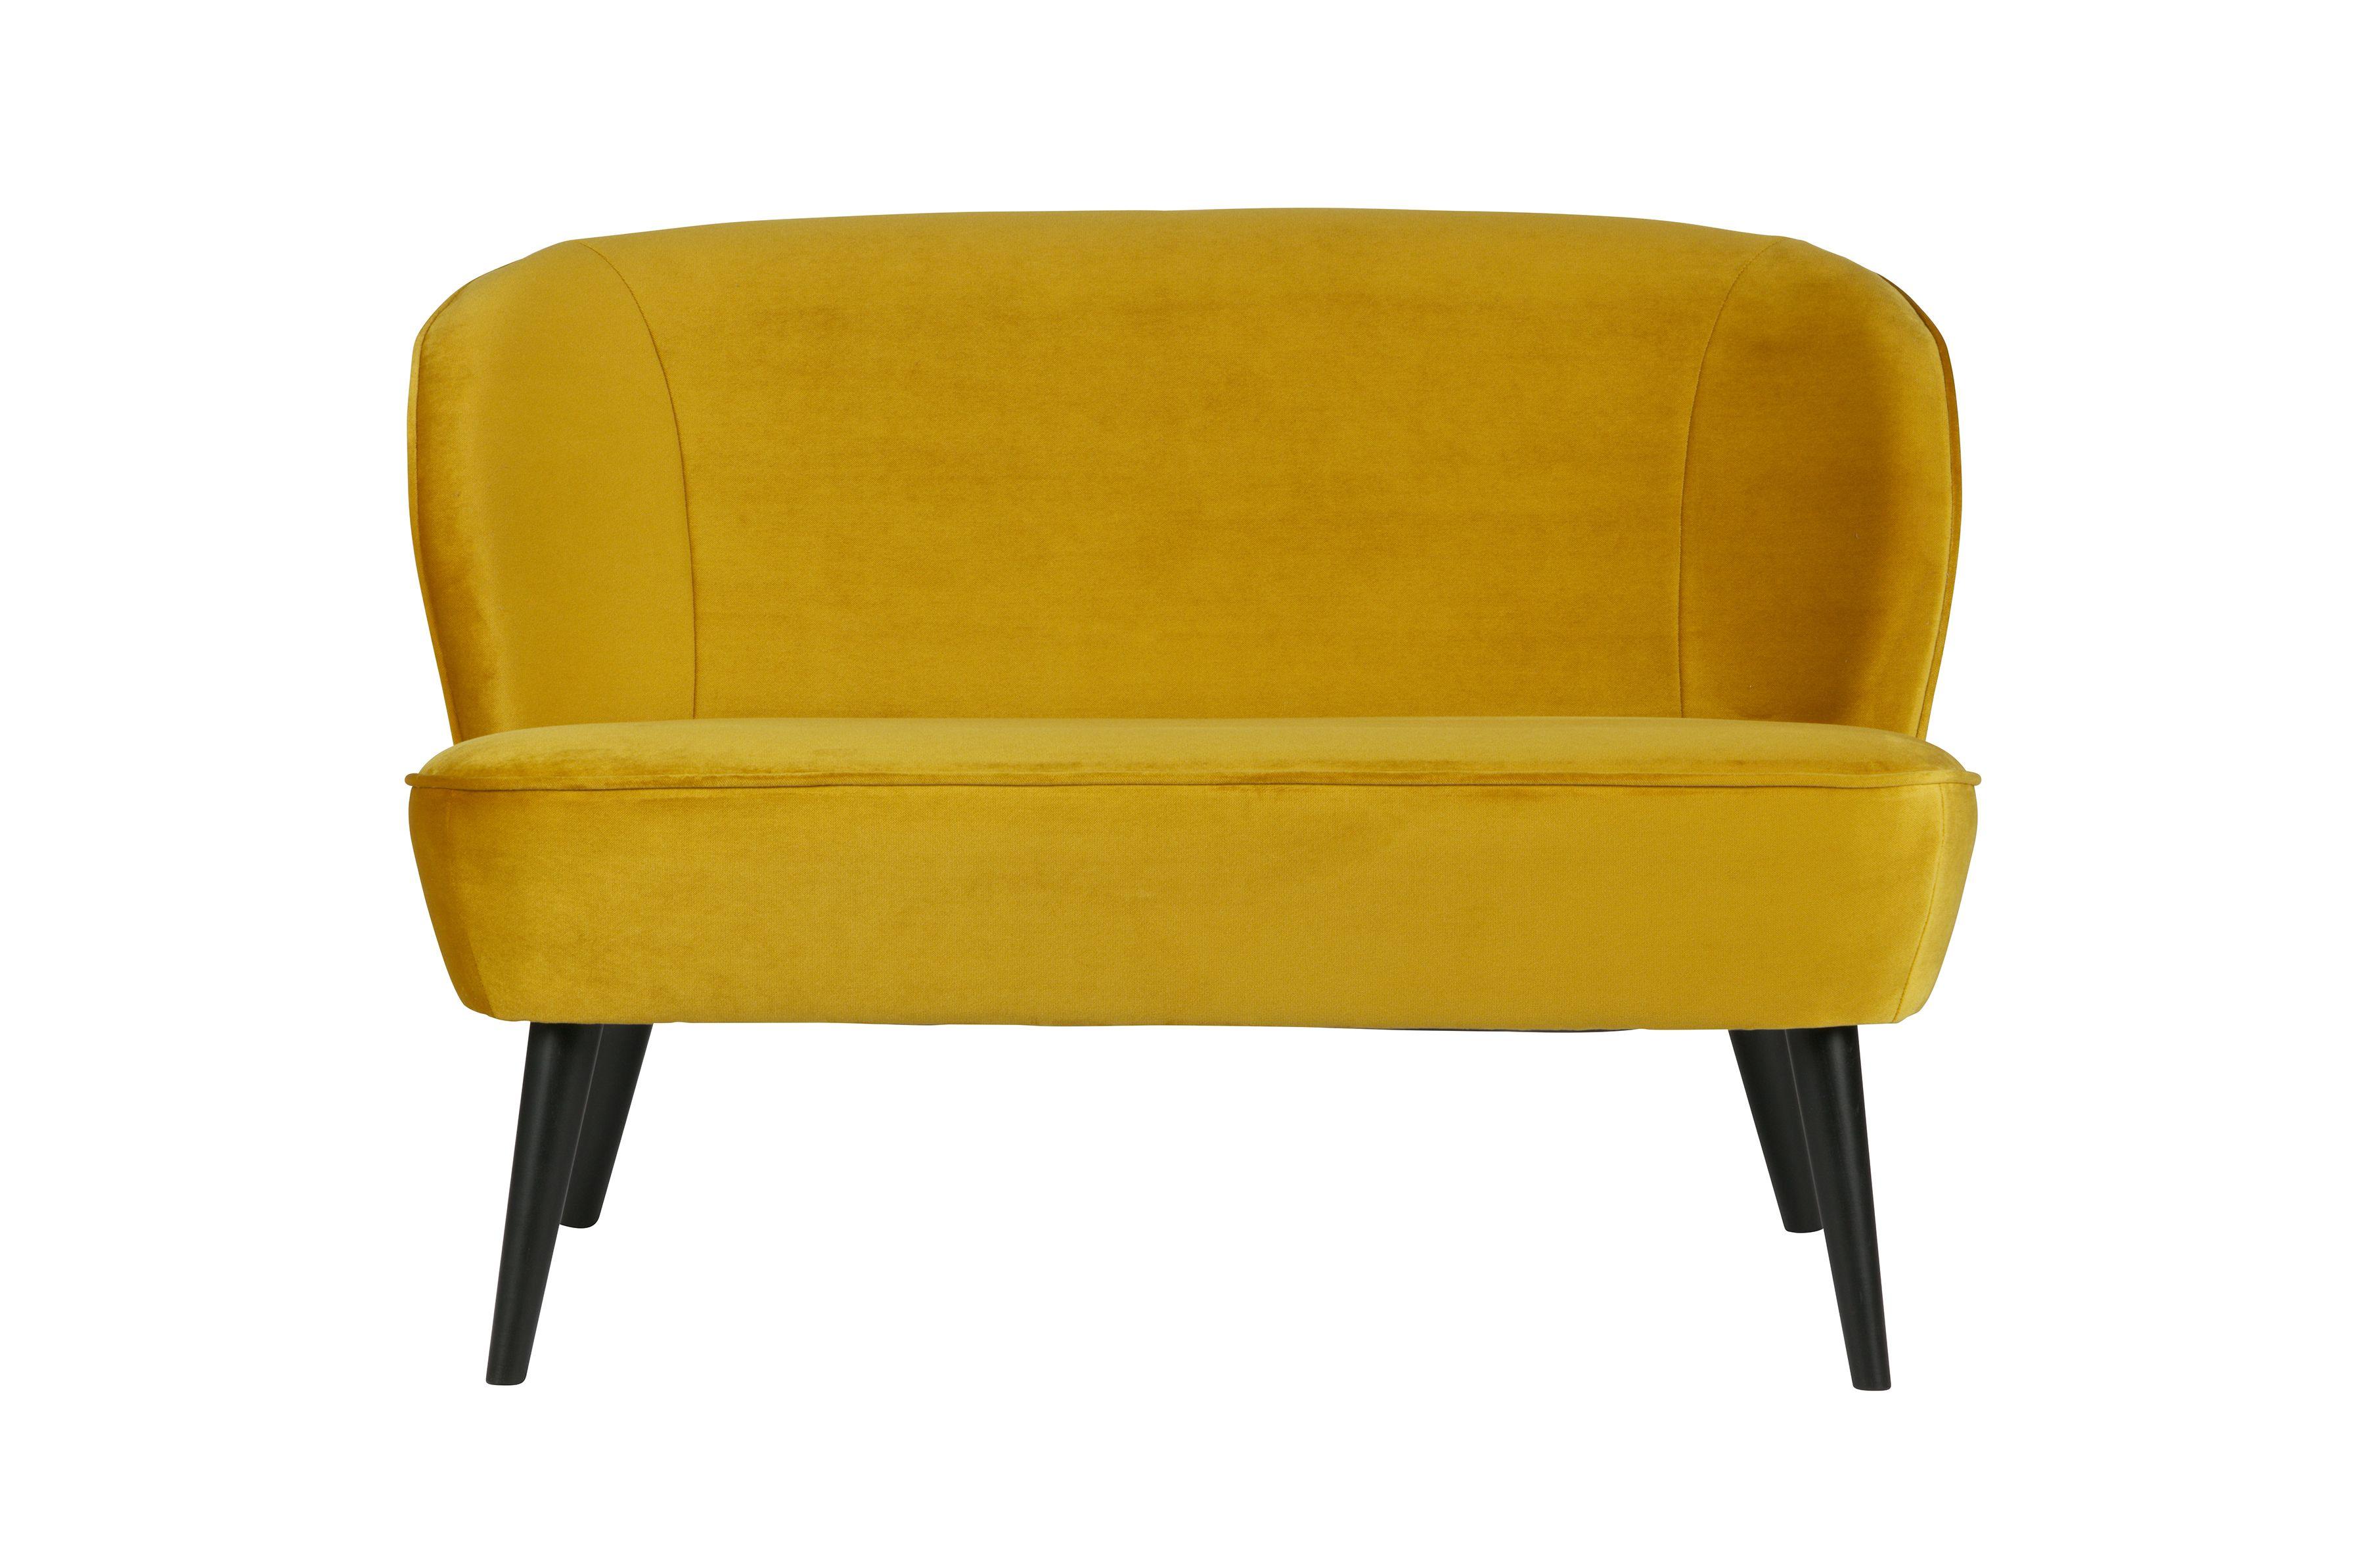 Sara bankje fluweel oker woood okerrrrrr sofa